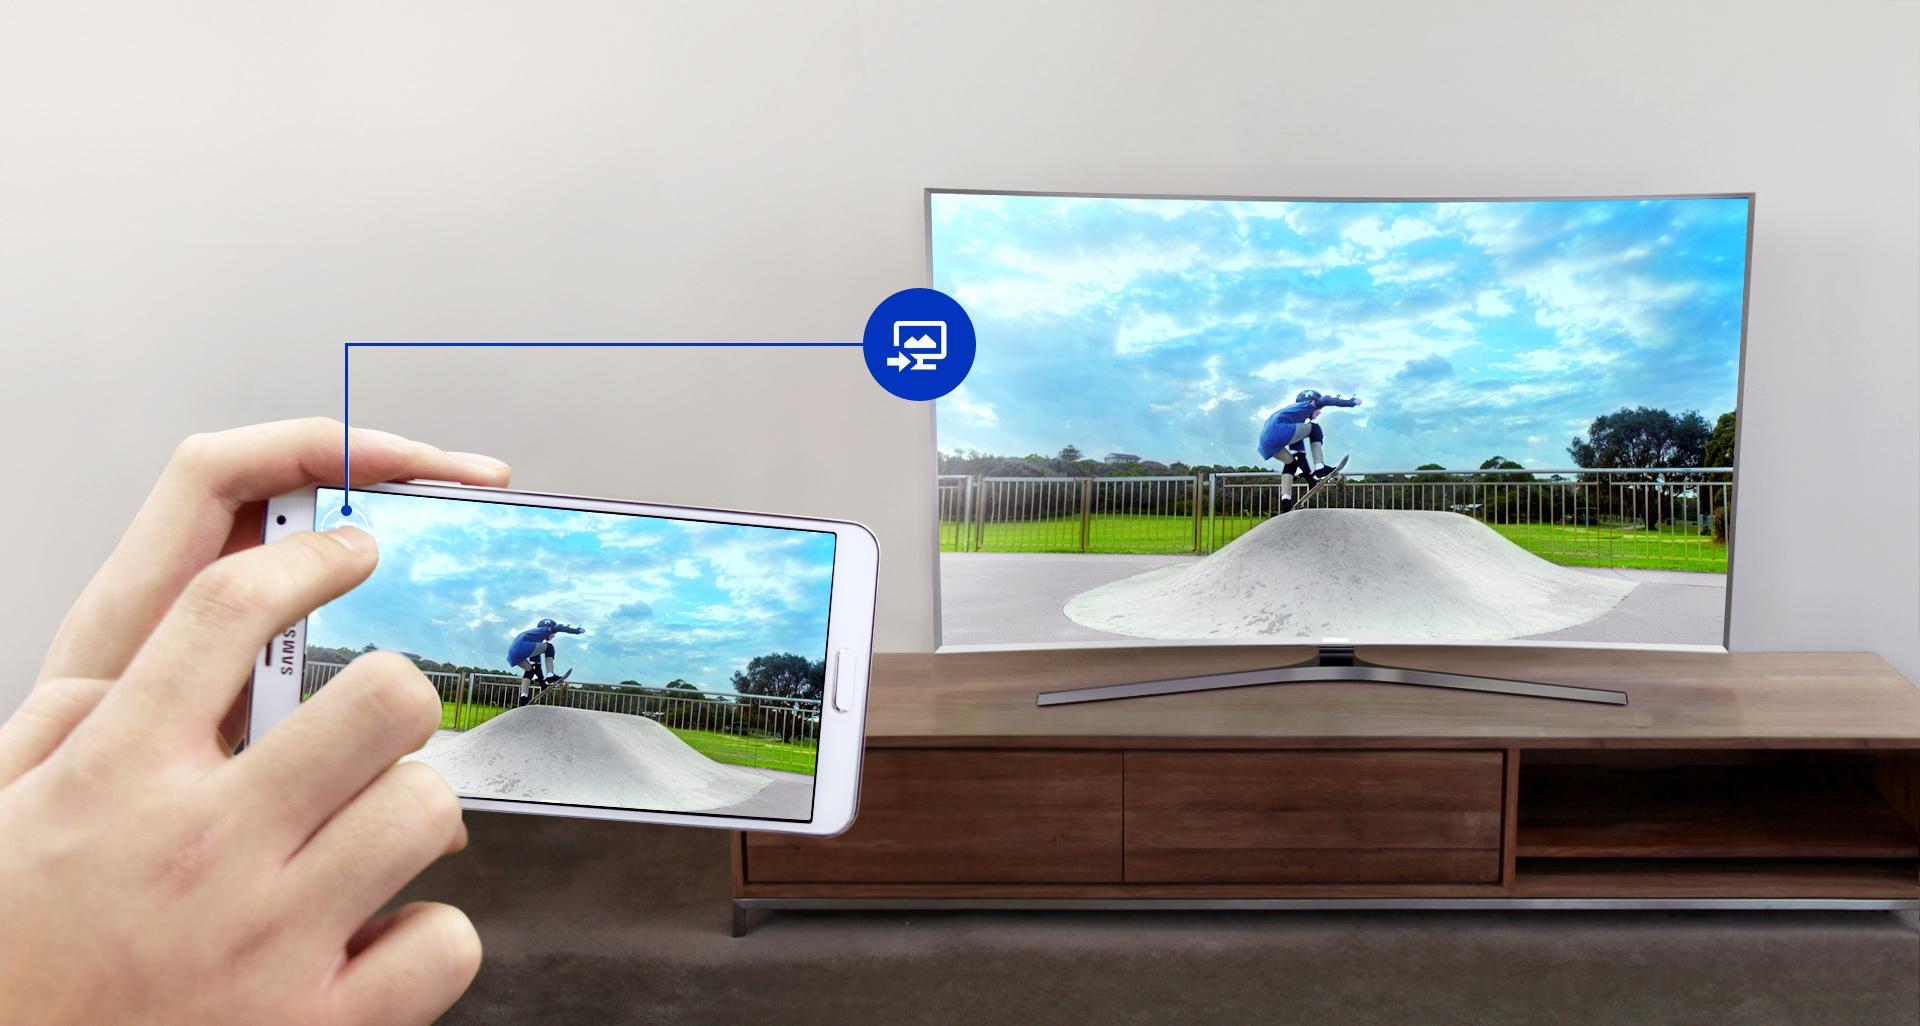 Технология управления телевизором с телефона